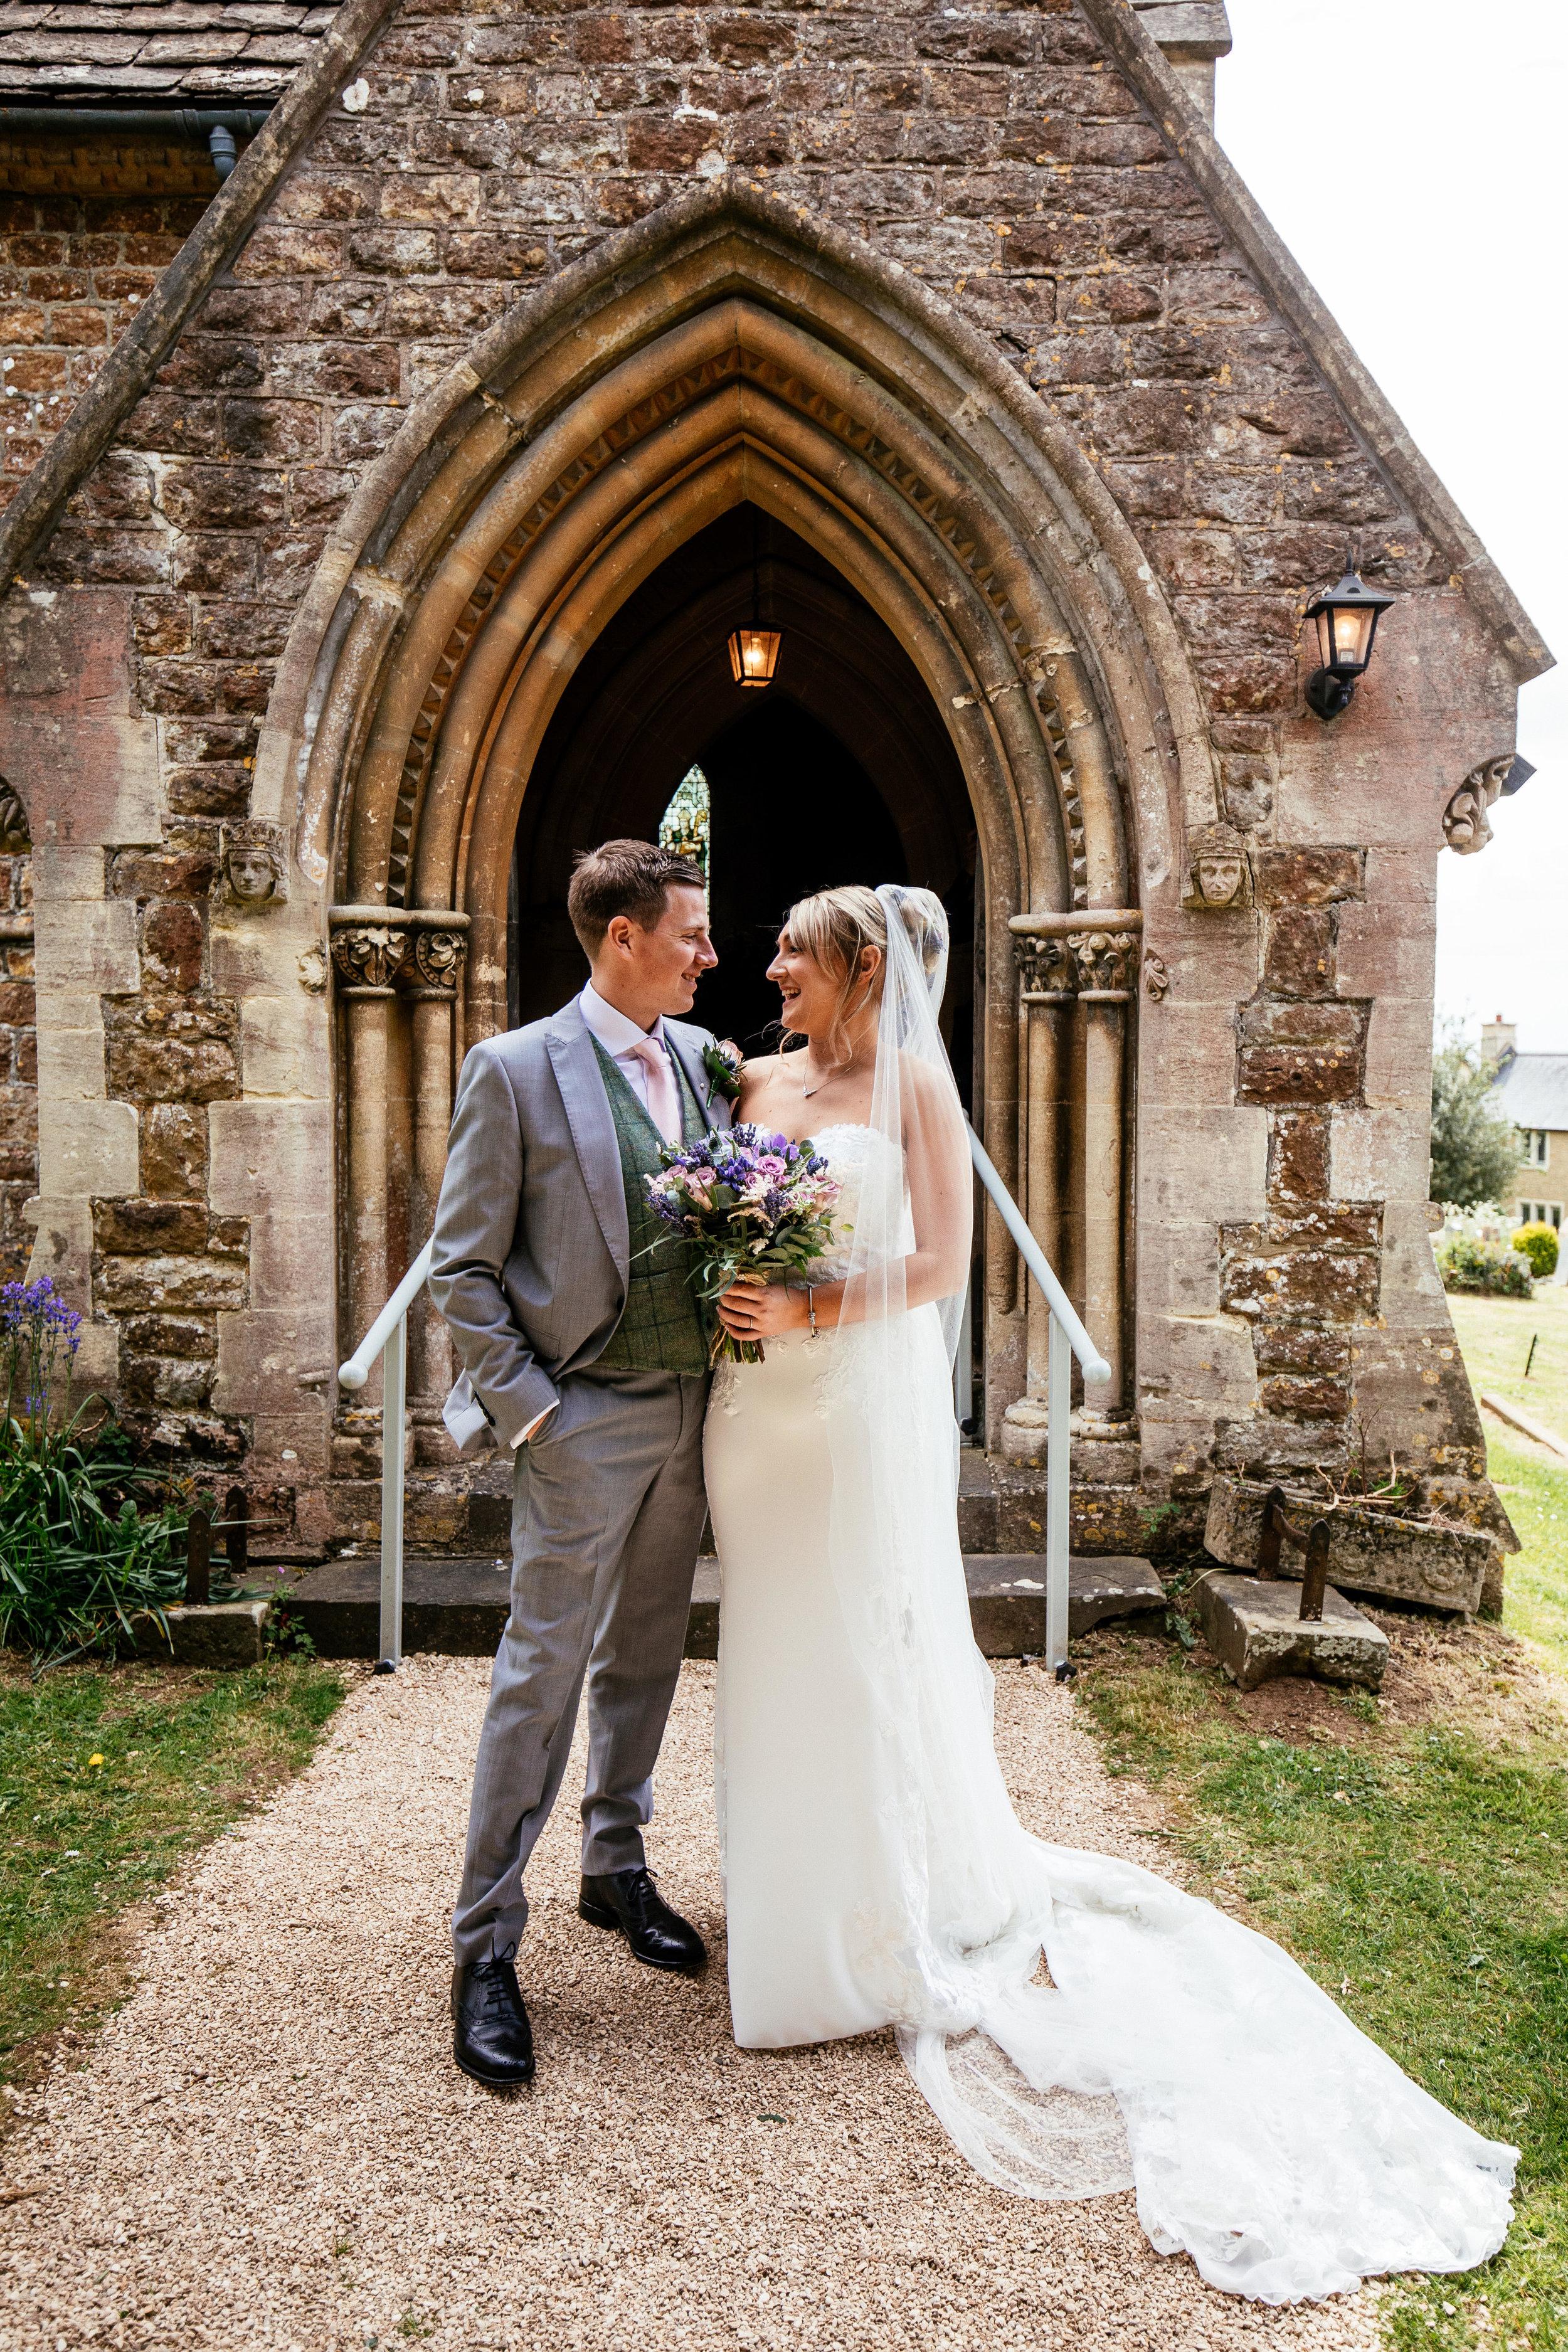 Becky-and-Sam-Wedding-Highlights-24.jpg